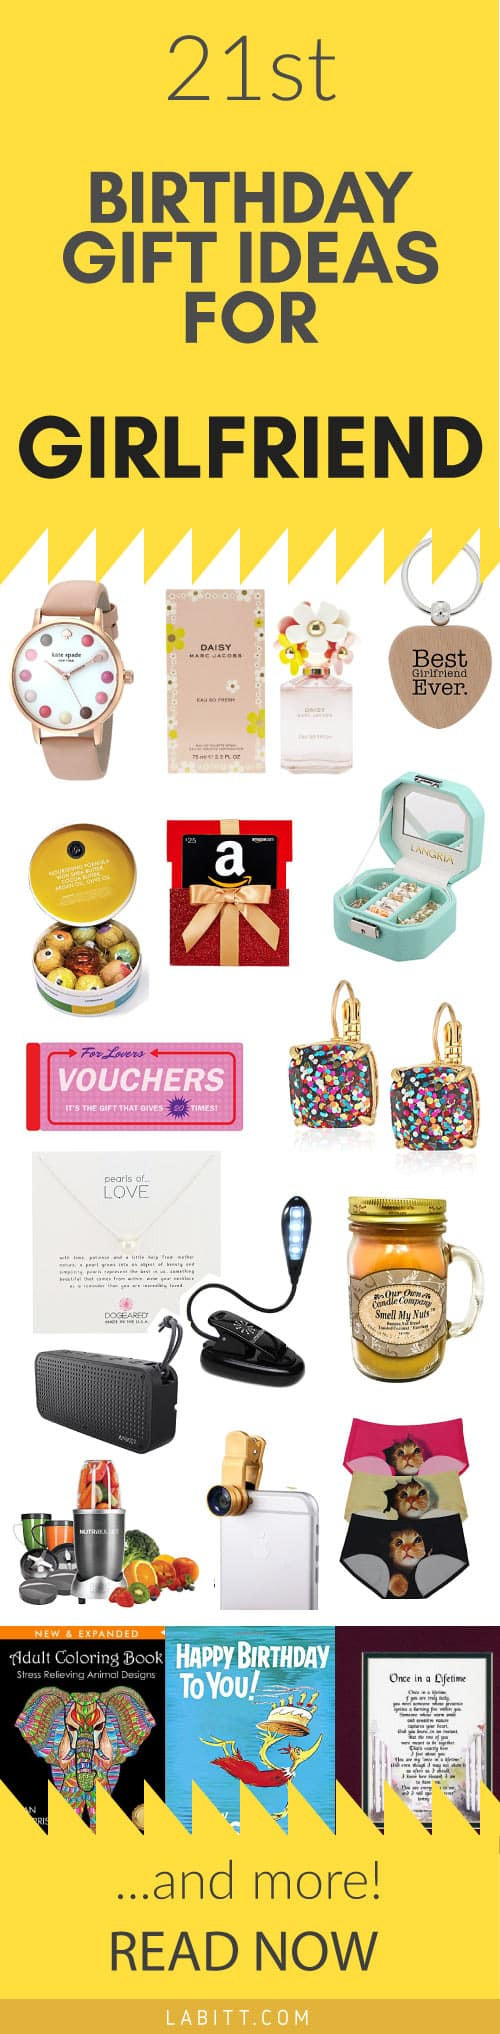 Girlfriend Bday Gift Ideas  Creative 21st Birthday Gift Ideas for Girlfriend 21